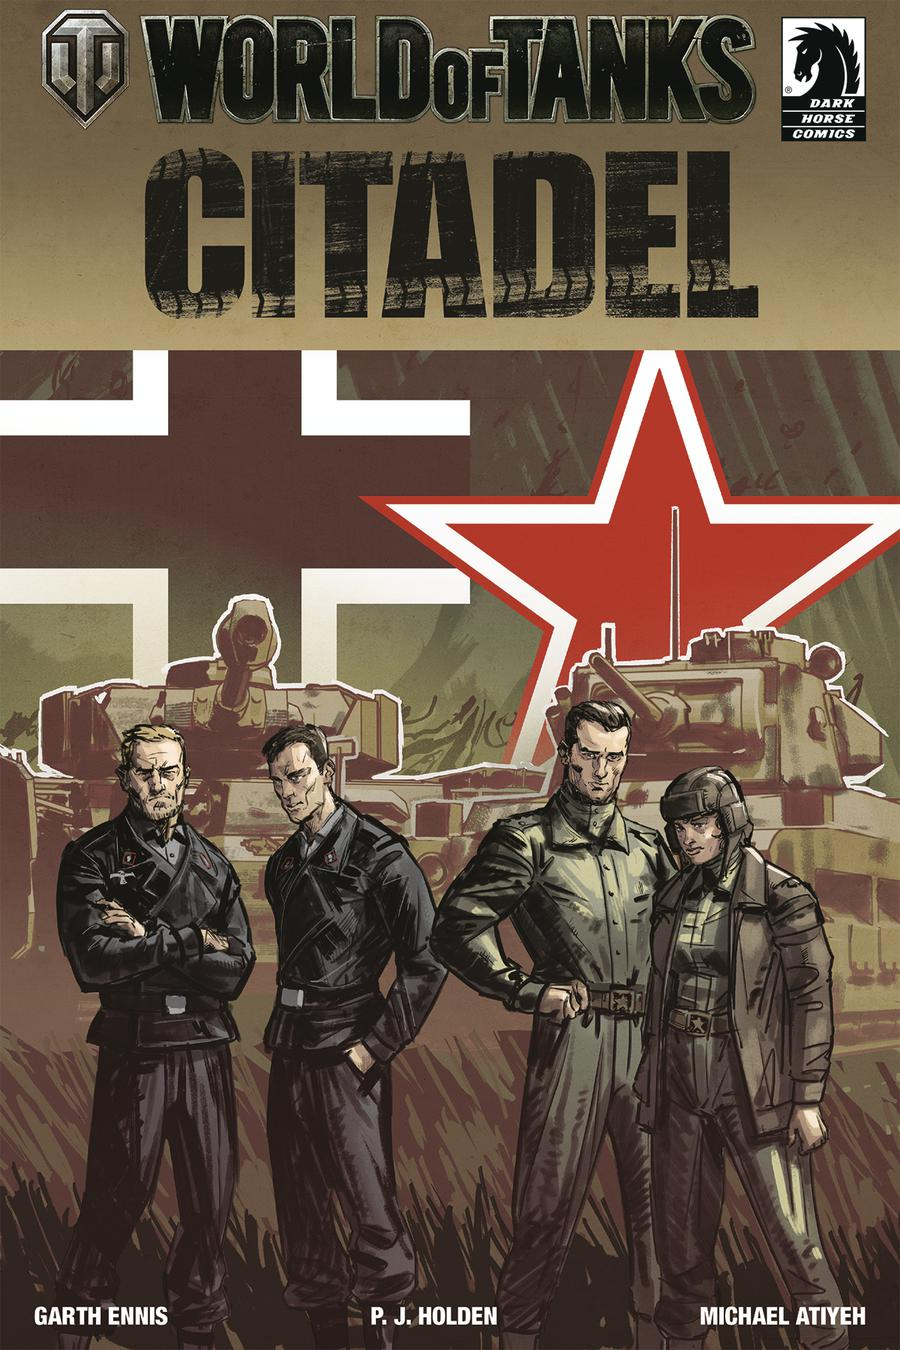 World Of Tanks Citadel #1